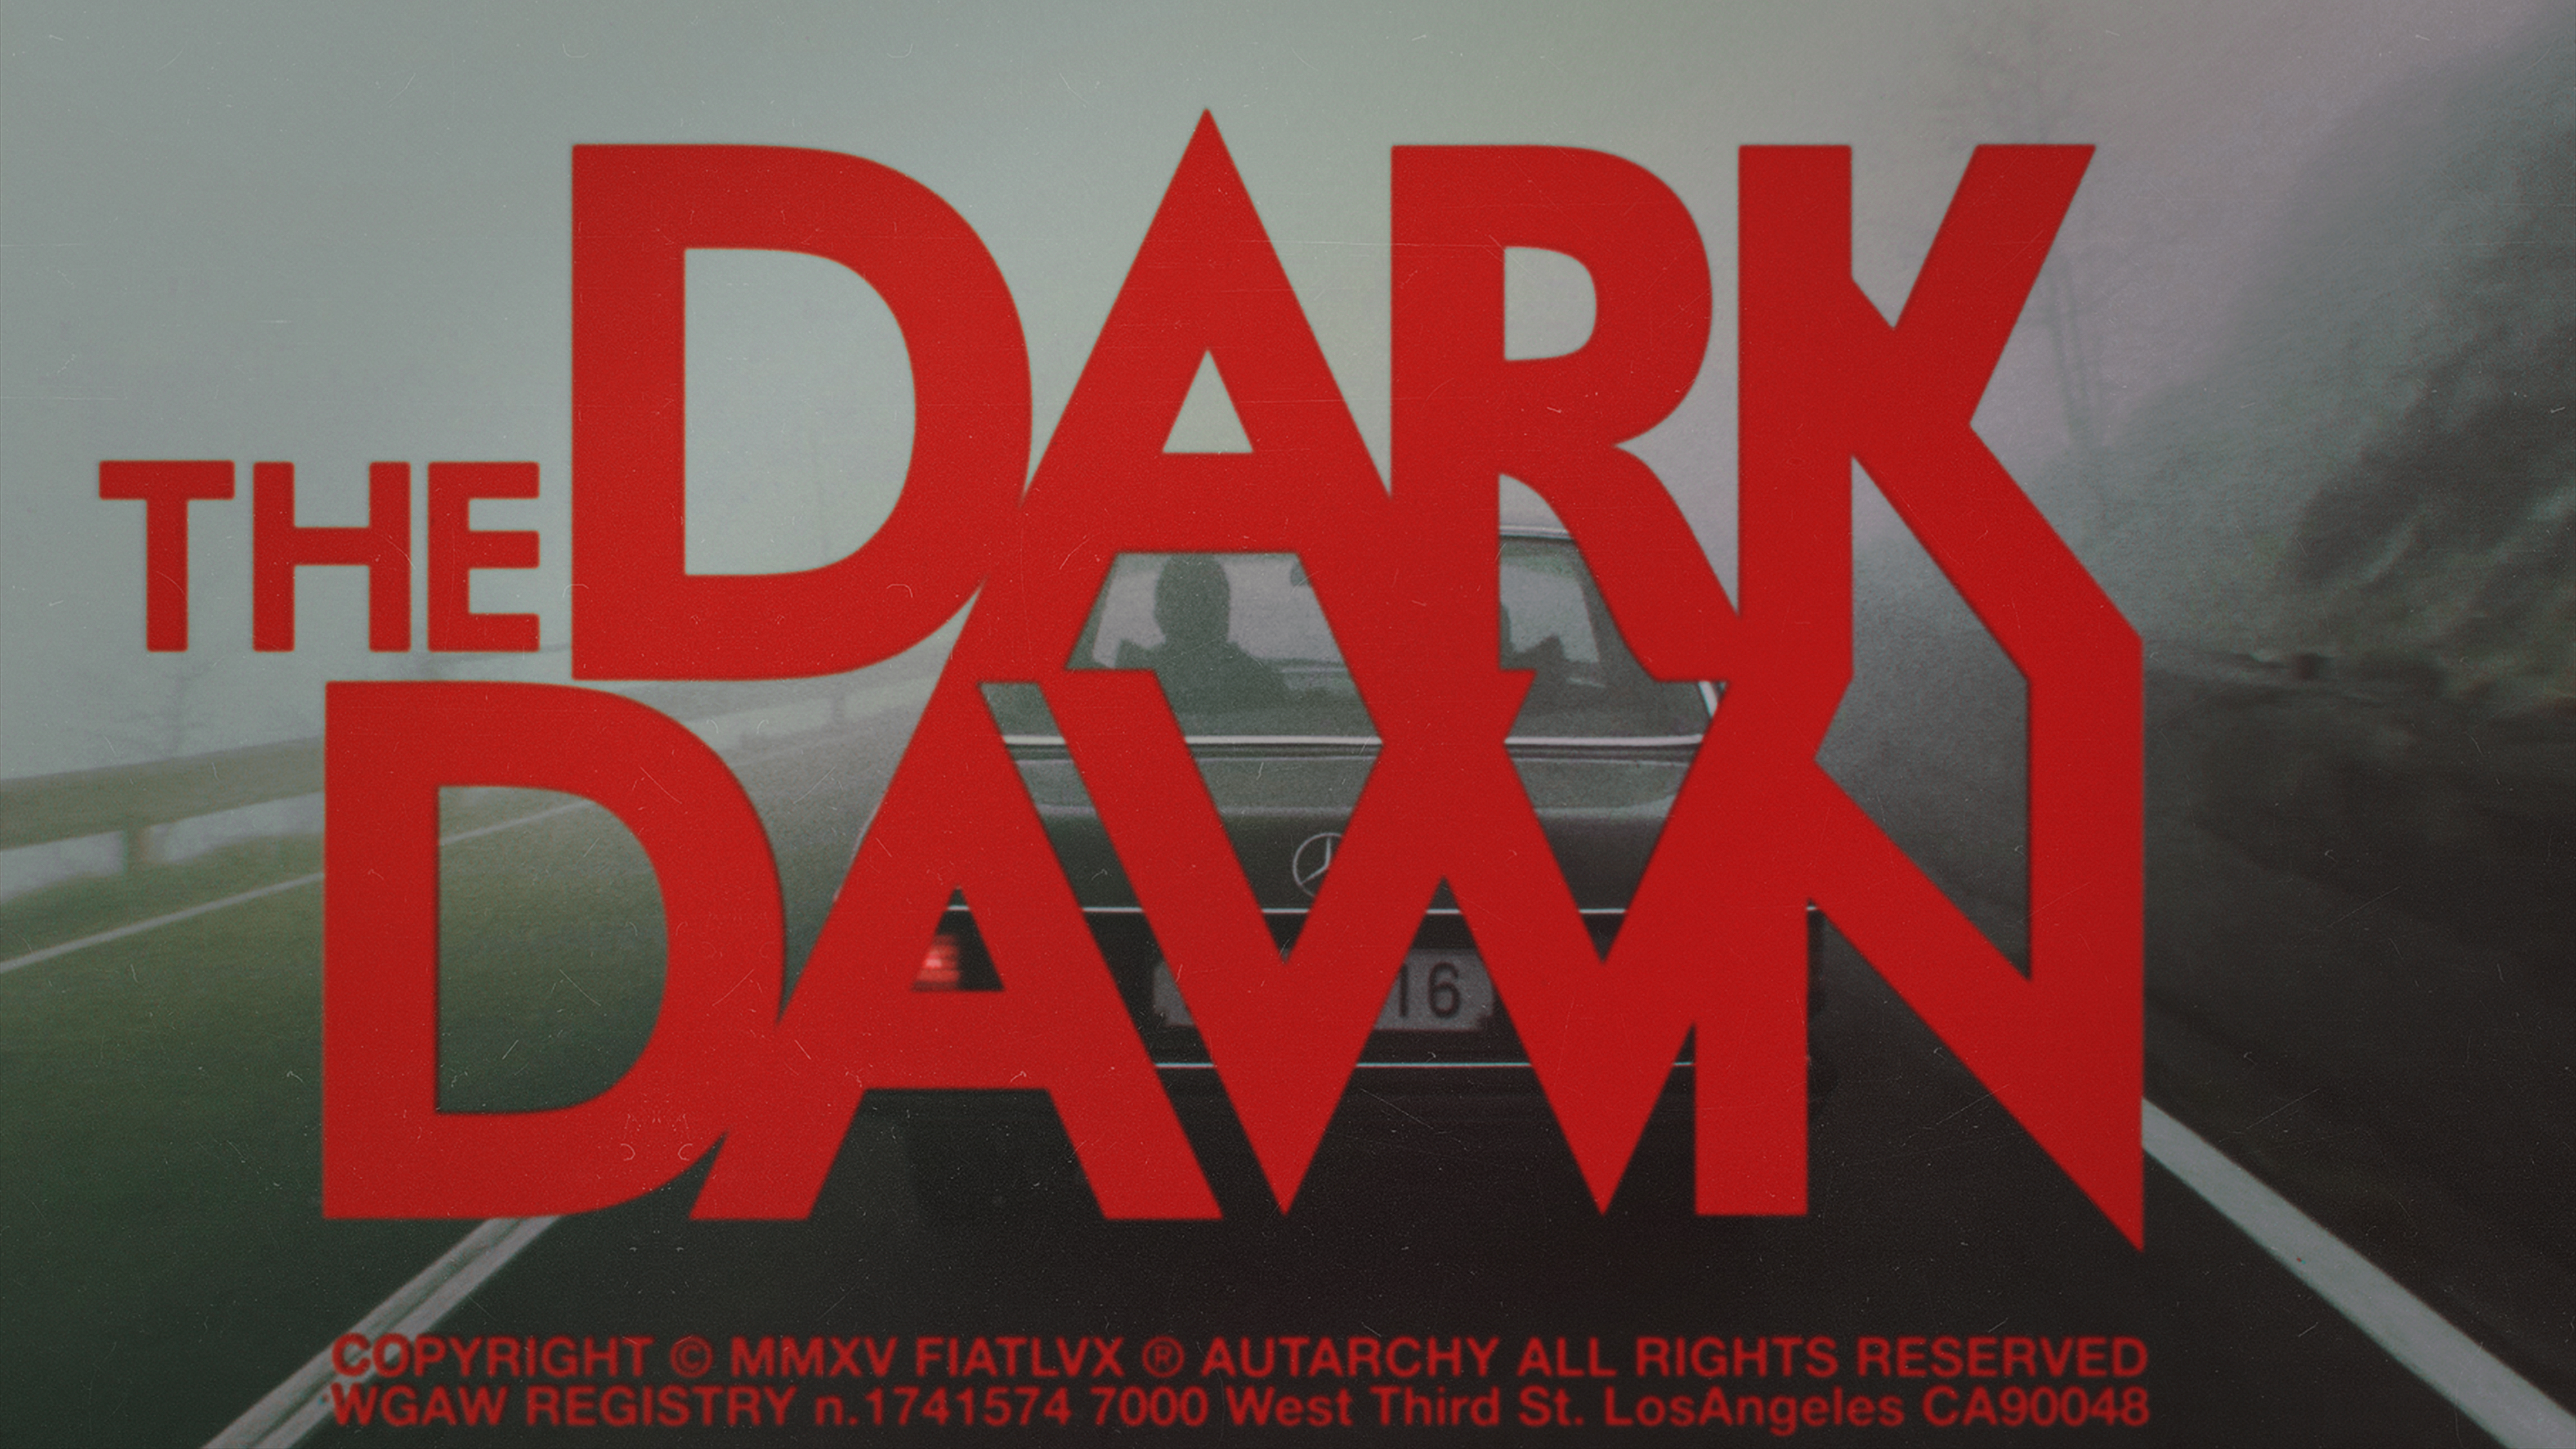 THE DARK DAWN